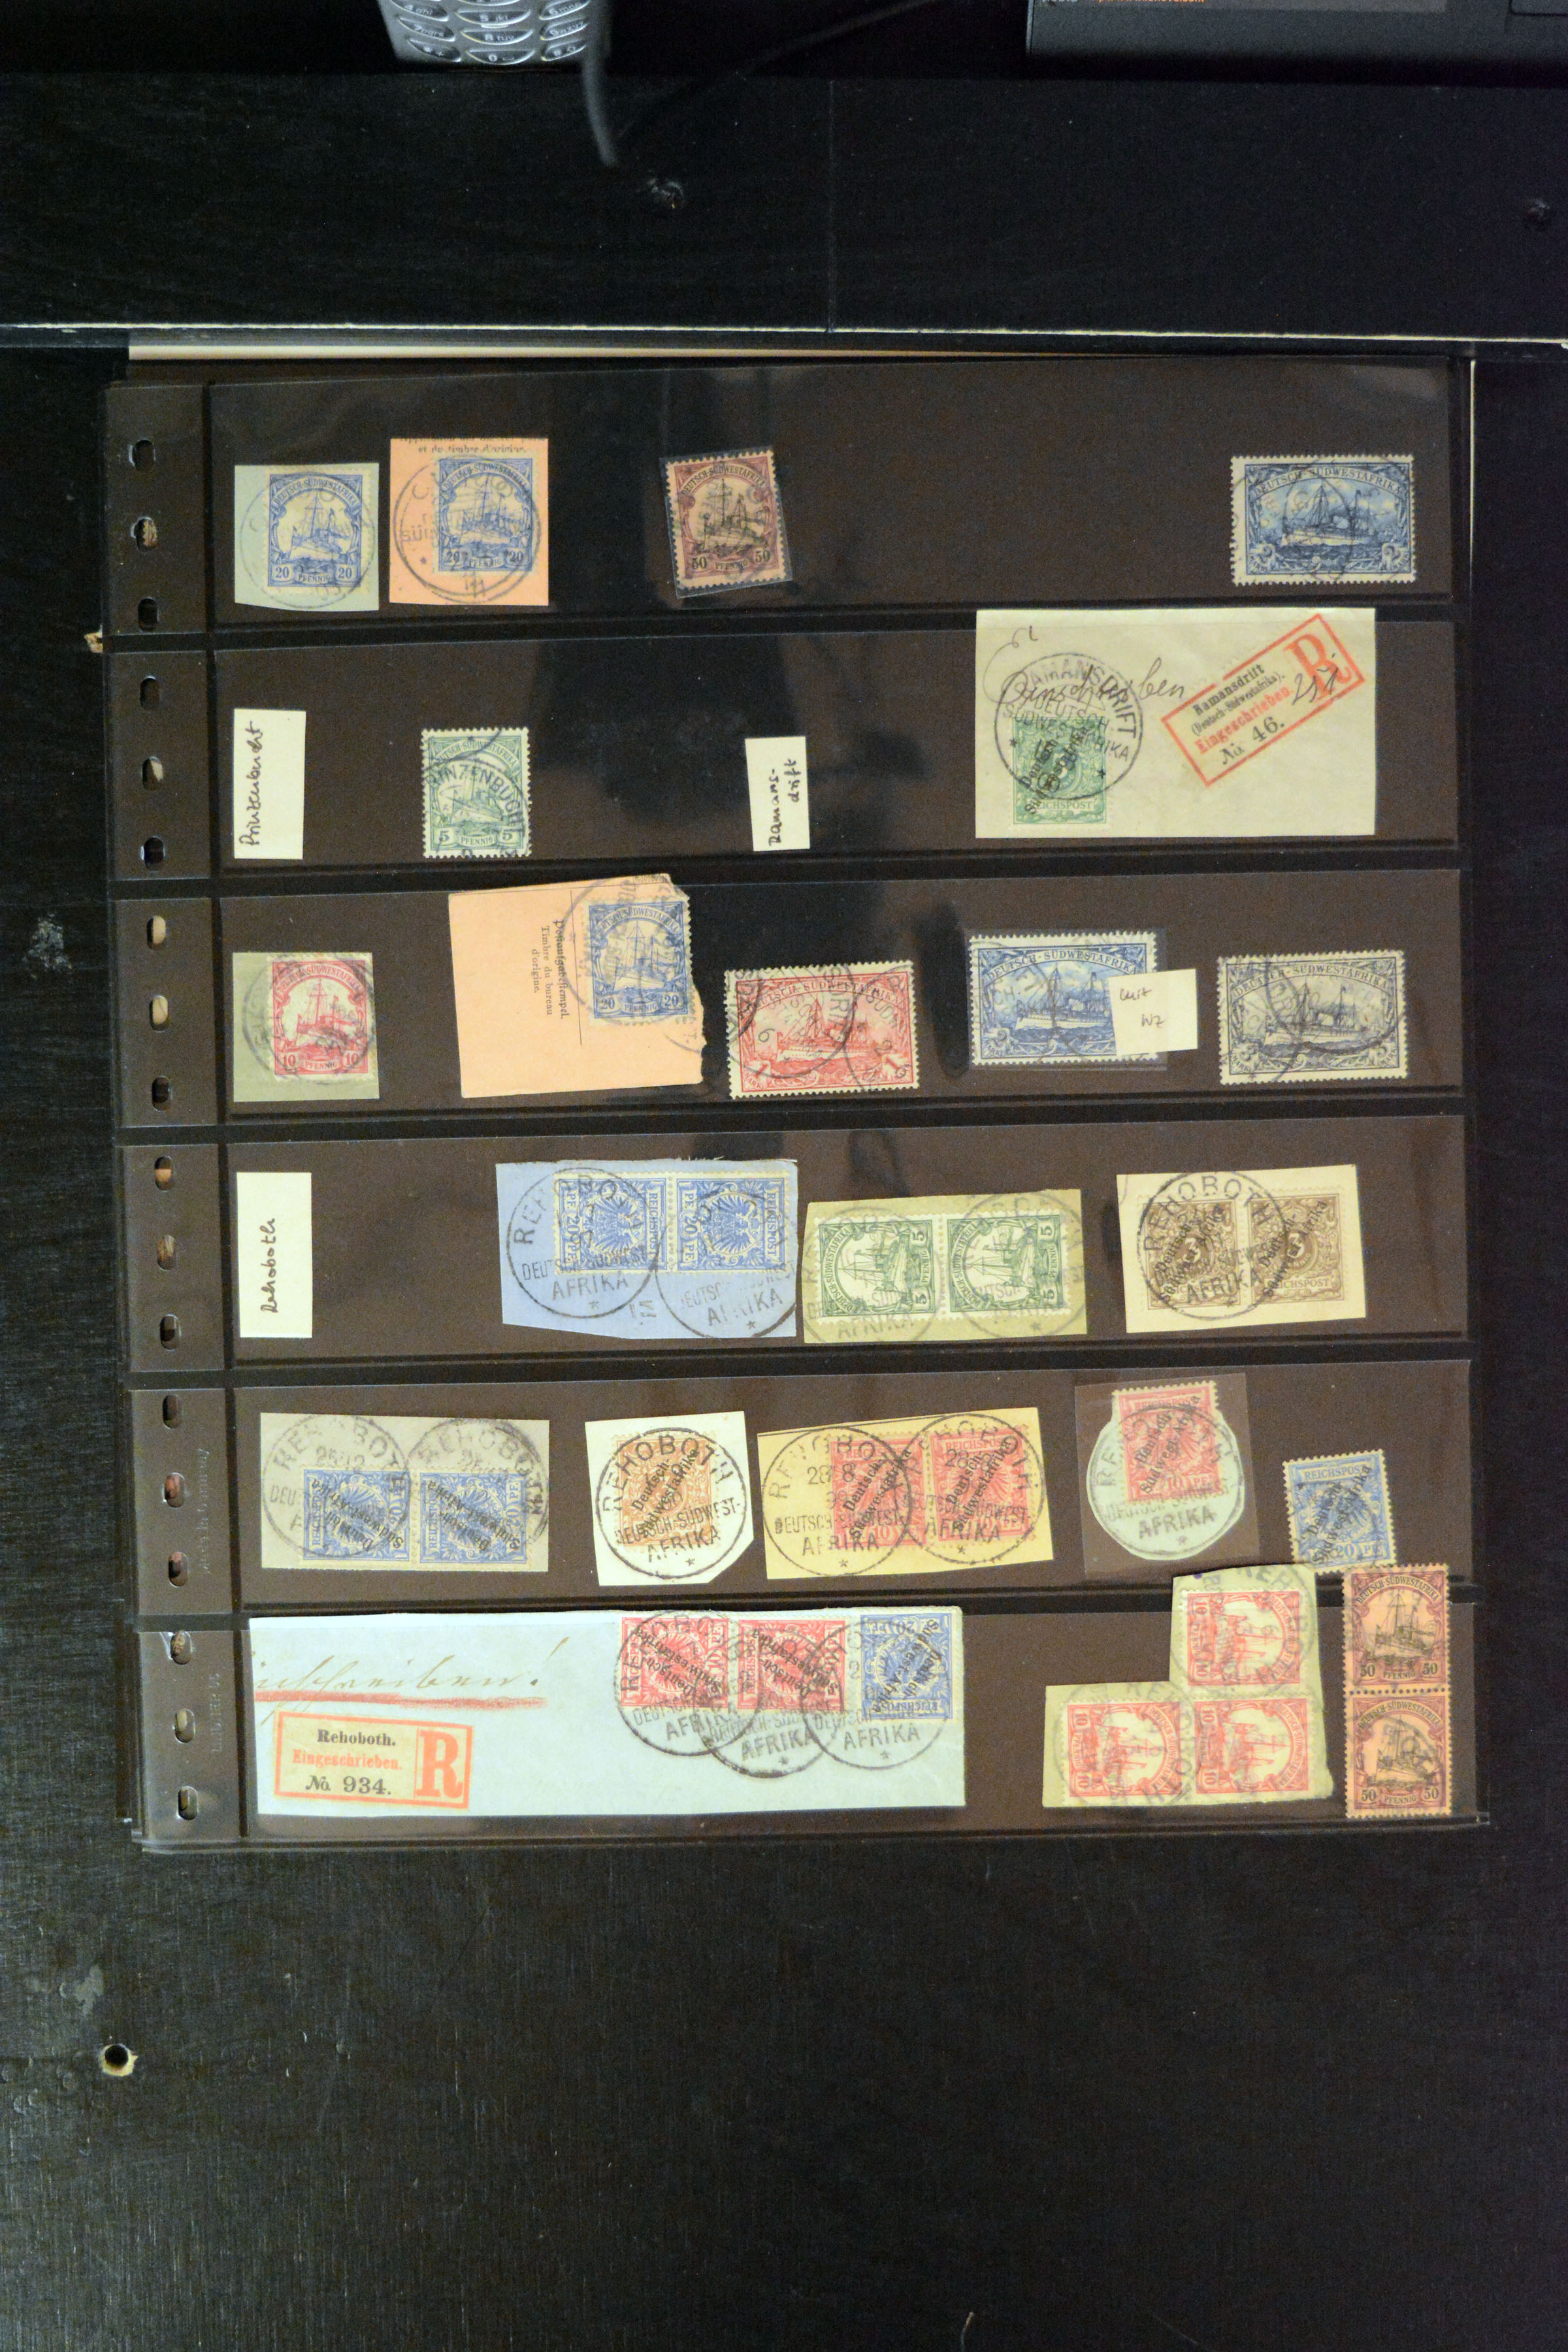 Lot 4881 - german colonies and offices abroad german south-west africa -  Heinrich Koehler Auktionen 373rd Heinrich Köhler auction - Day 3